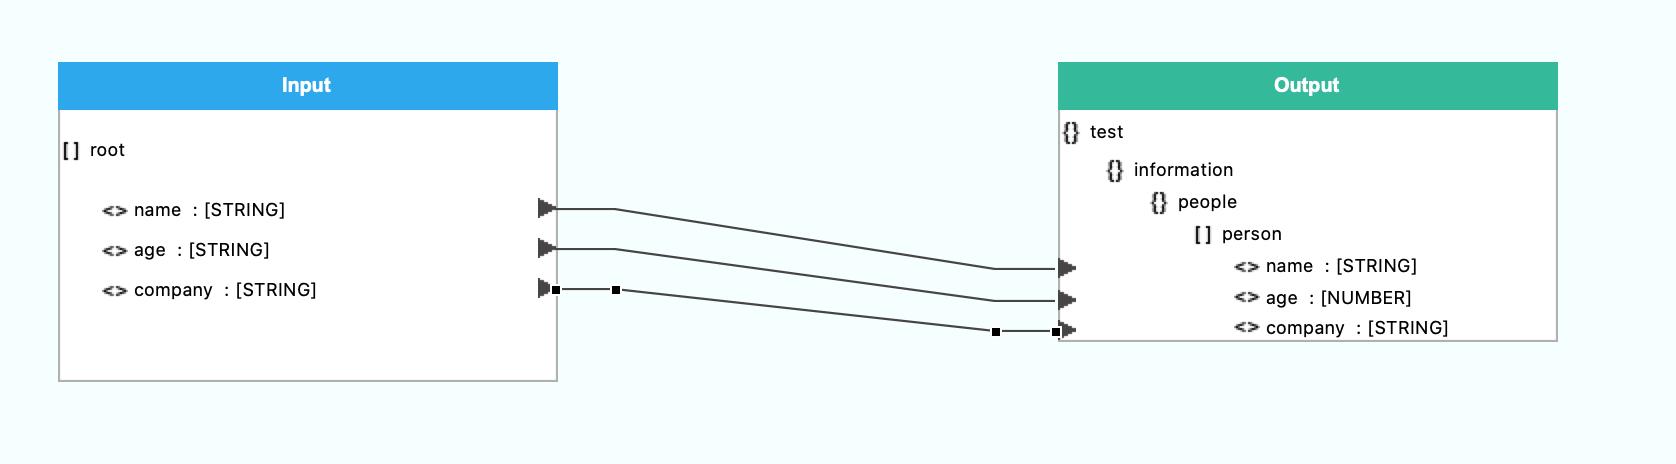 output datamapper dialog